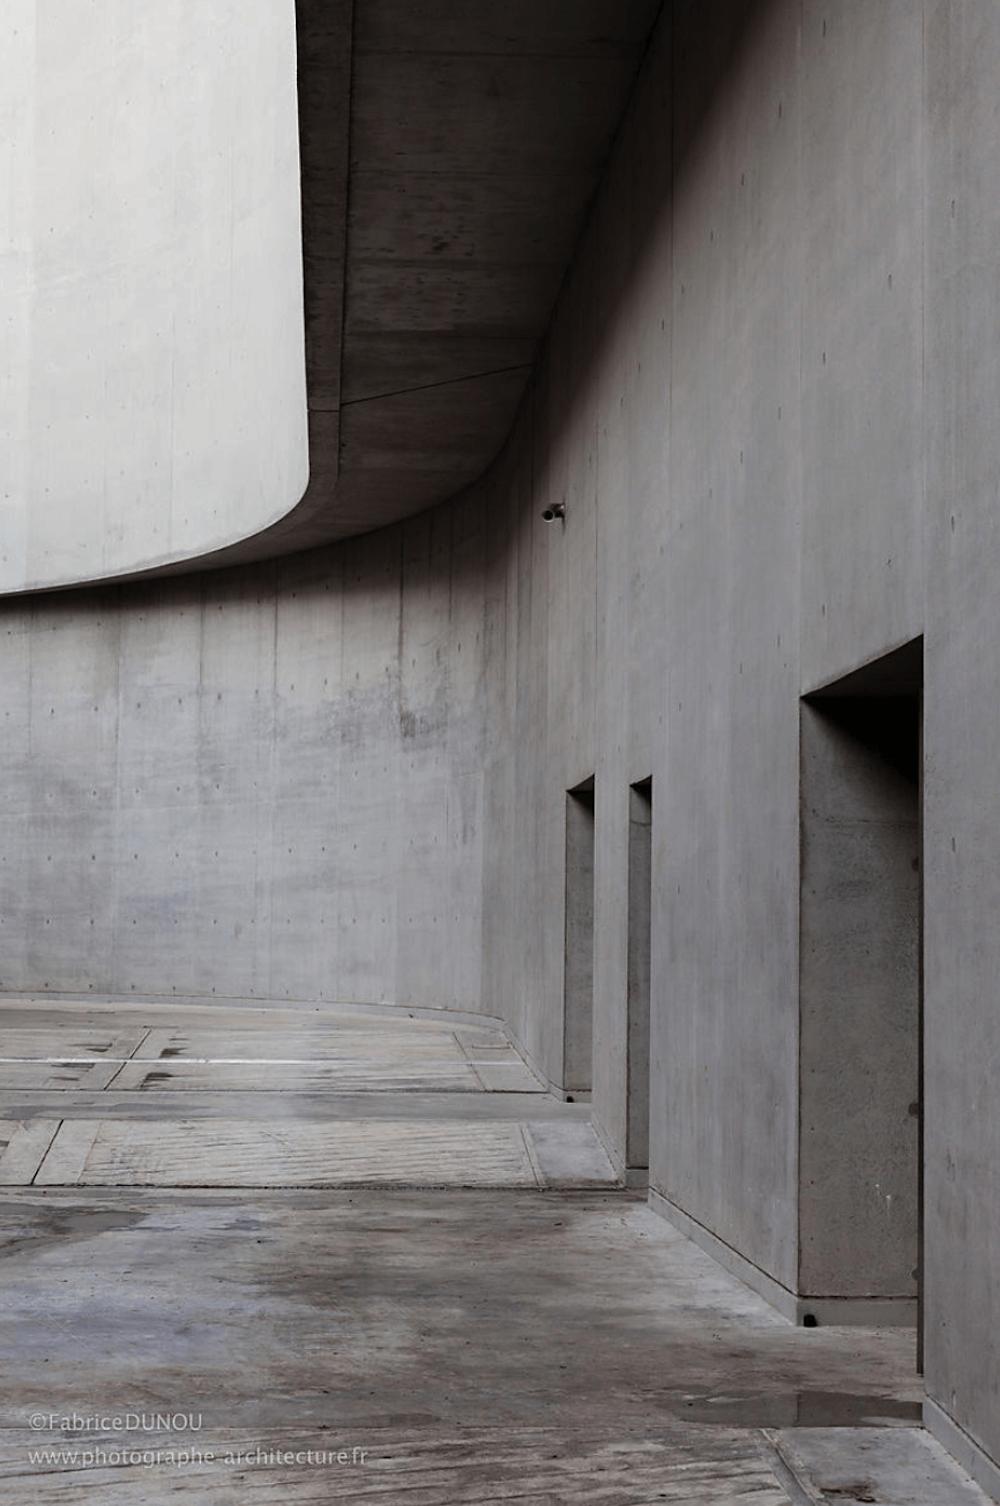 Interior of a grey minimalist building.